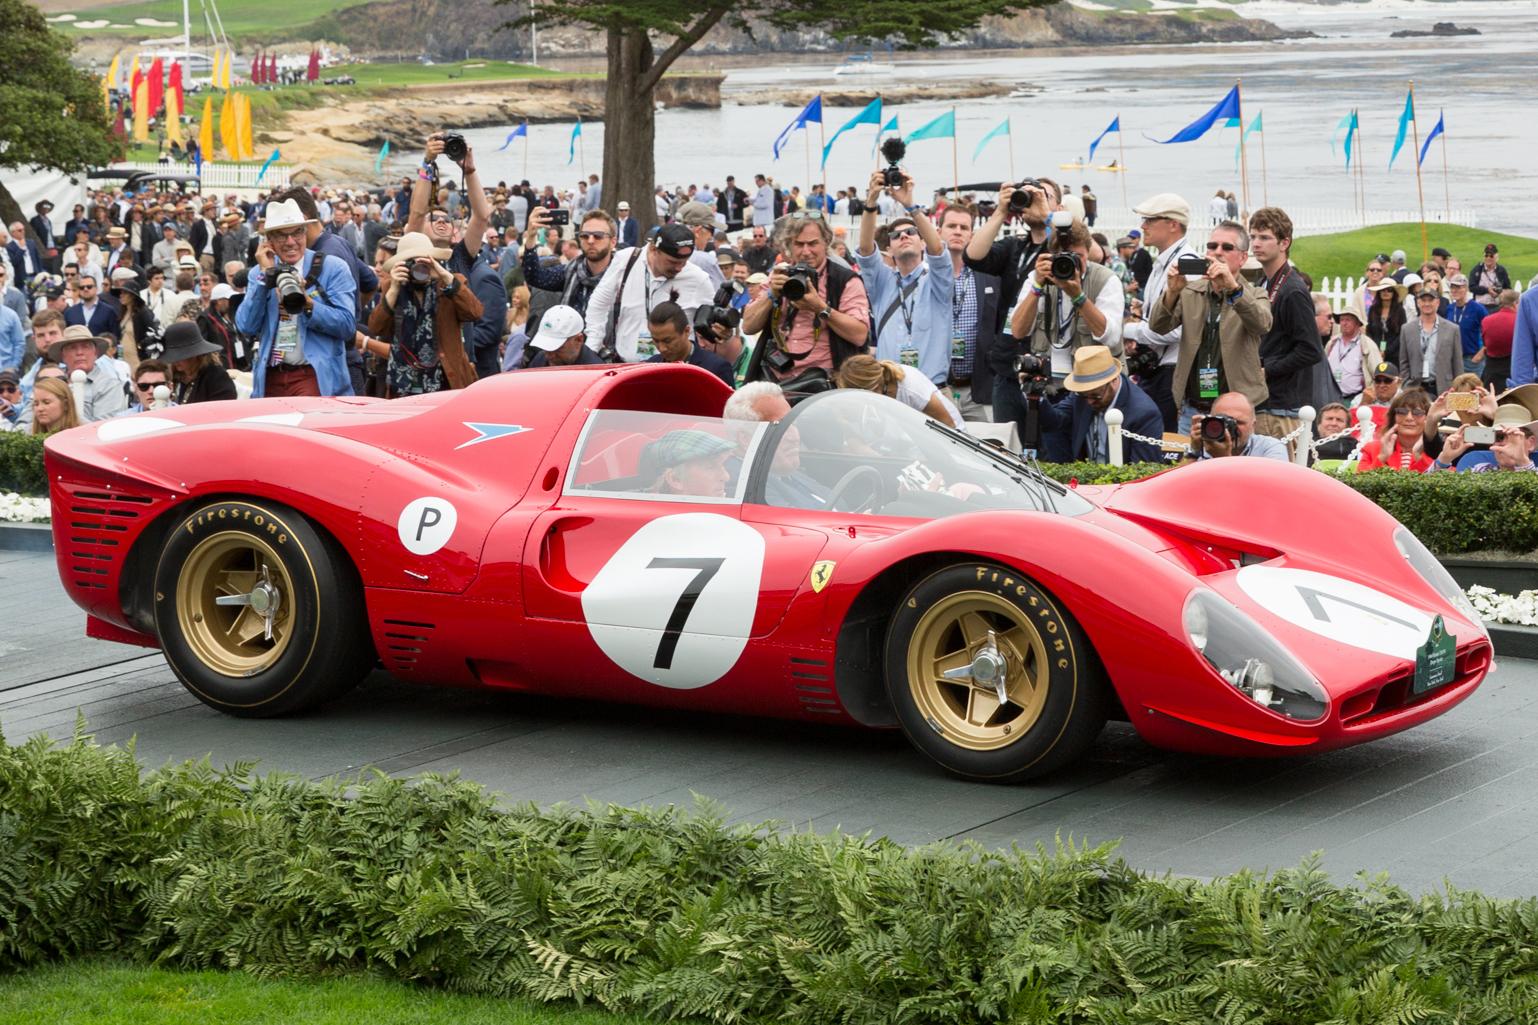 1966 Ferrari 330 P4 wins Gran Turismo Trophy at Pebble Beach 2016